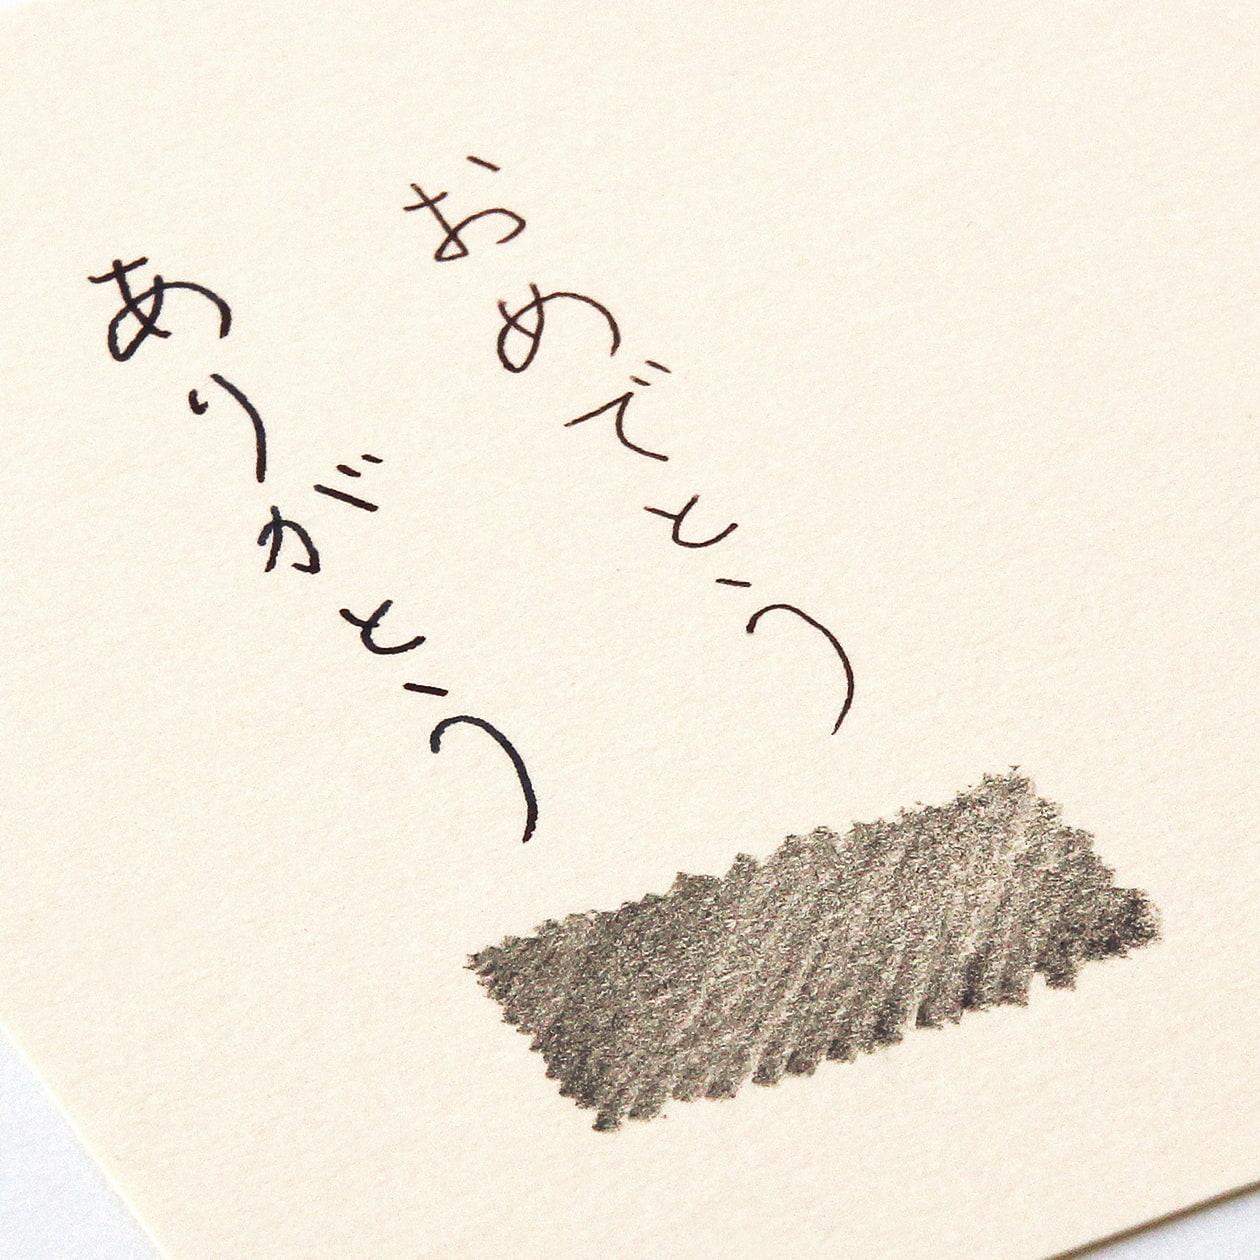 No.63ステップ PVカード ナチュラル 232.8g